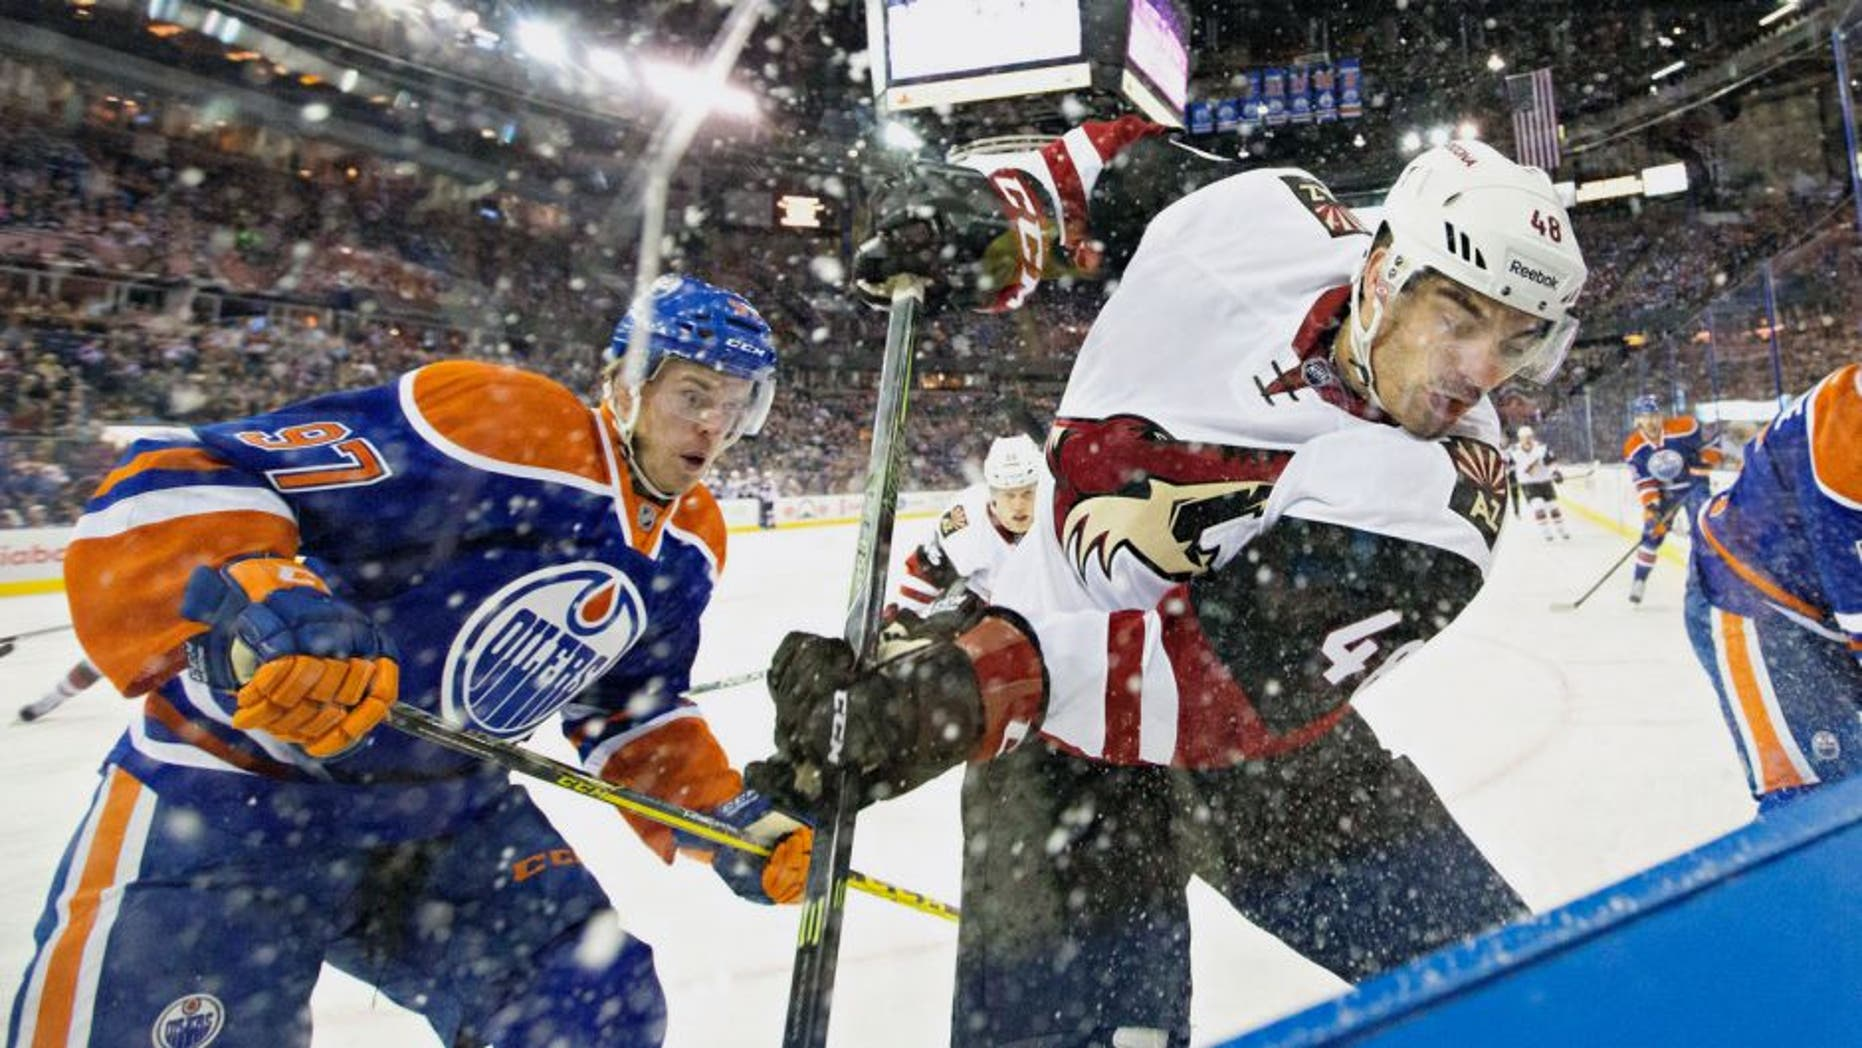 Arizona Coyotes' Jordan Martinook, right, and Edmonton Oilers' Connor McDavid (97) battle in the corner during the first period of a preseason NHL hockey game in Edmonton, Alberta, Tuesday, Sept. 29, 2015. (Jason Franson/The Canadian Press via AP) MANDATORY CREDIT